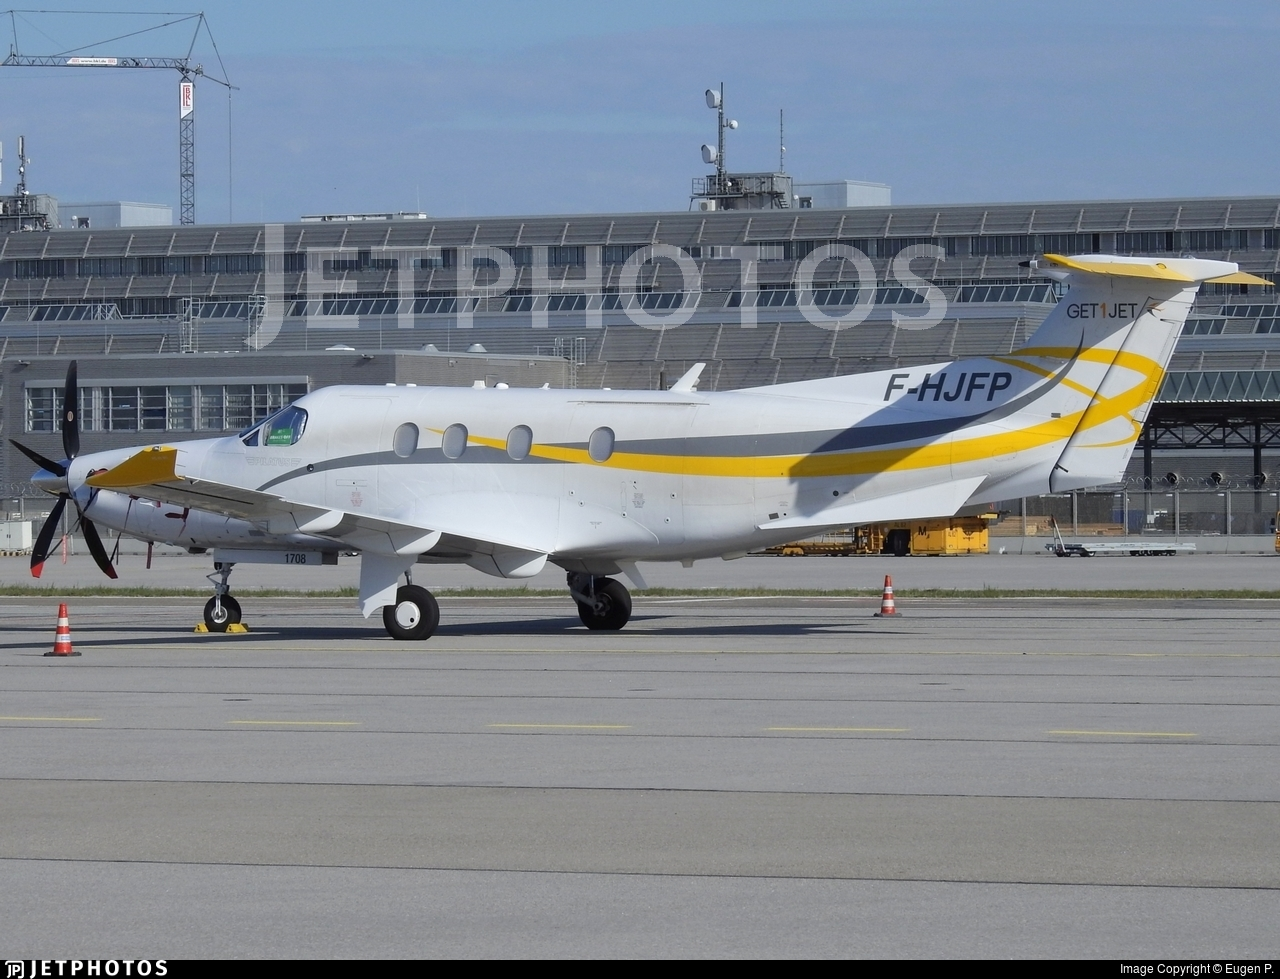 F-HJFP - Pilatus PC-12/47E - Get1jet